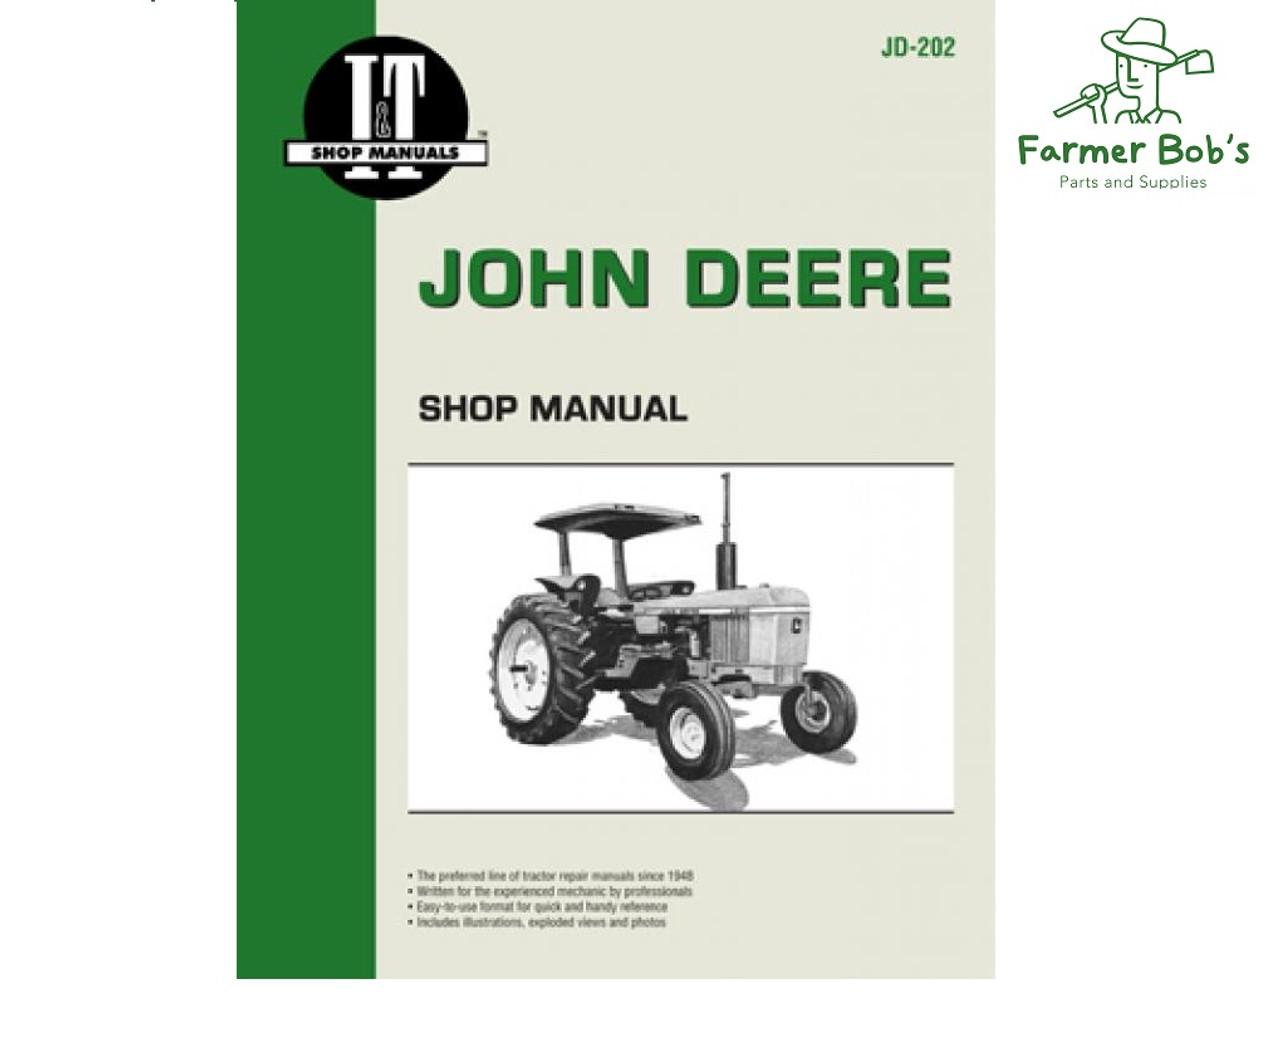 small resolution of jd202 i u0026t shop manuals john deere 2510 2520 2040 2240